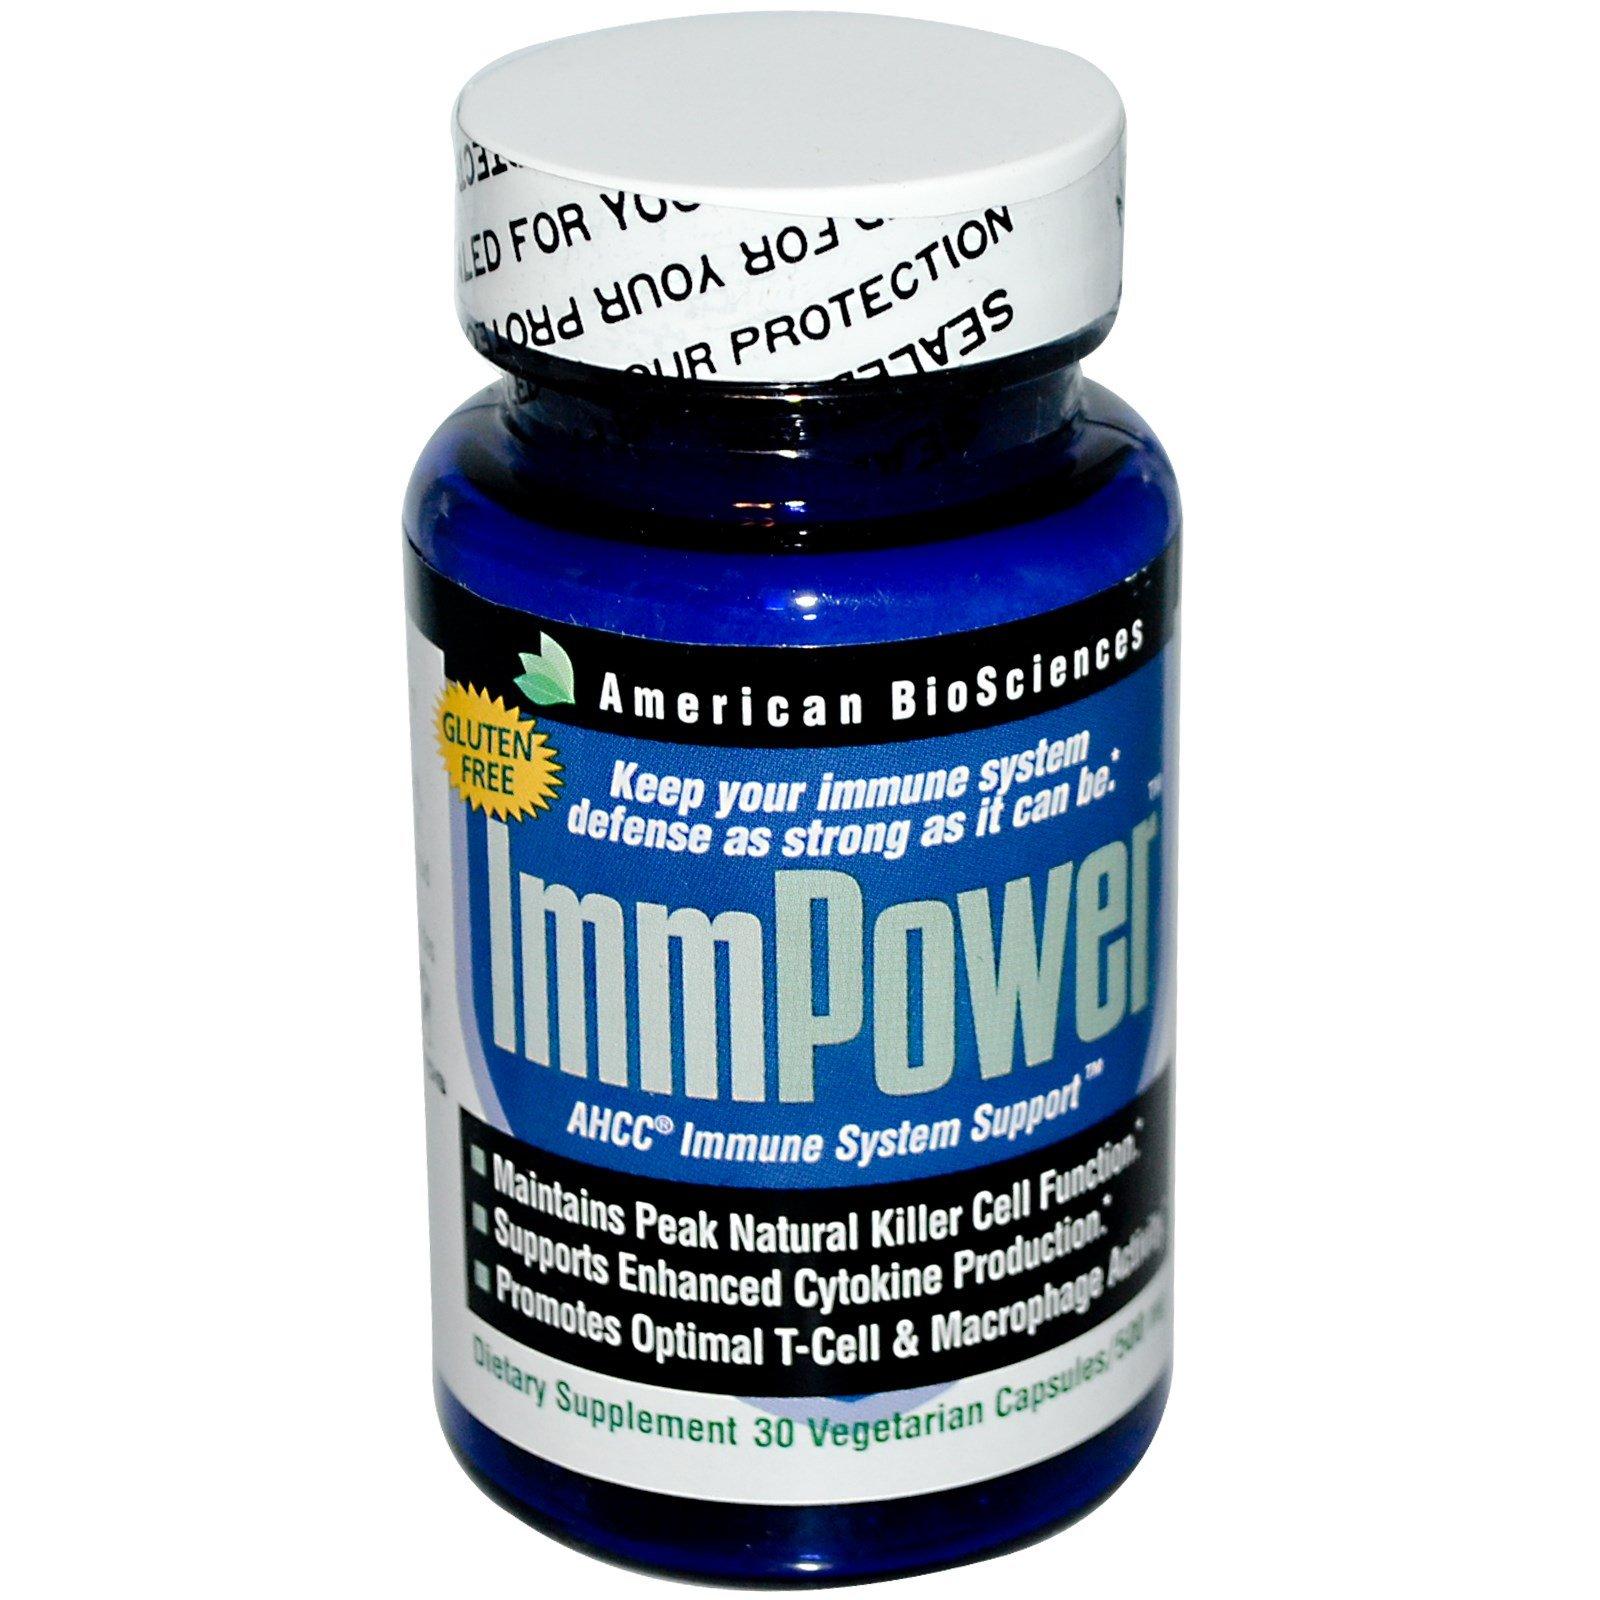 American Biosciences, ImmPower, AHCC Immune System Support, 500 mg, 30 Veggie Caps - 3PC